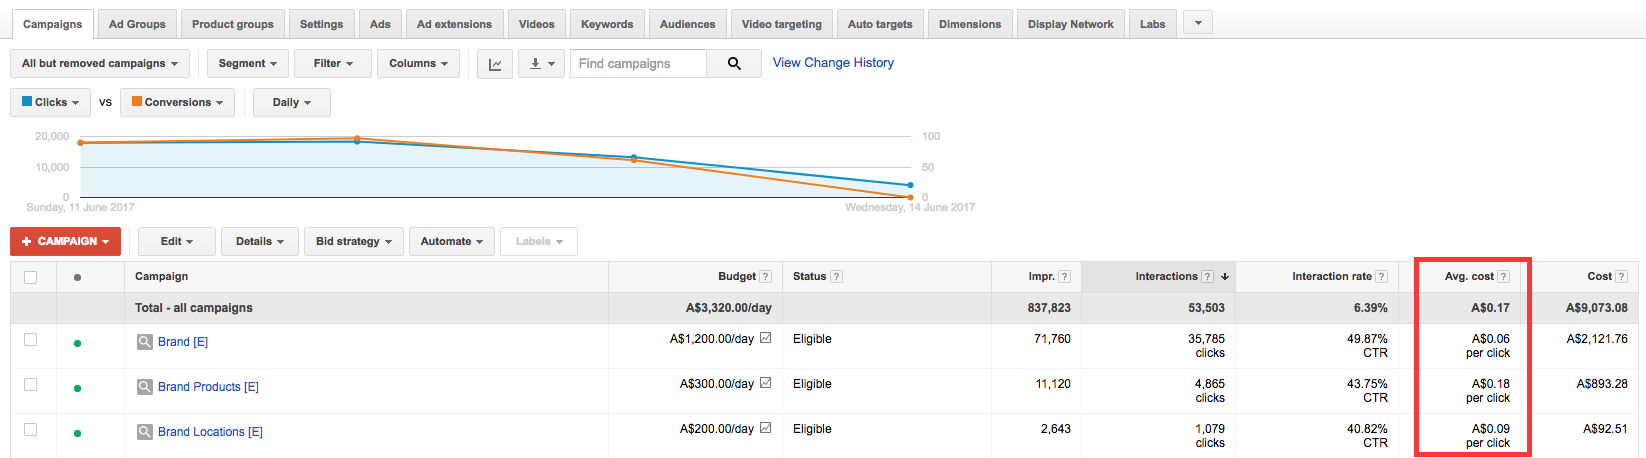 Digital_Marketing_Model_Screenshot_1.png